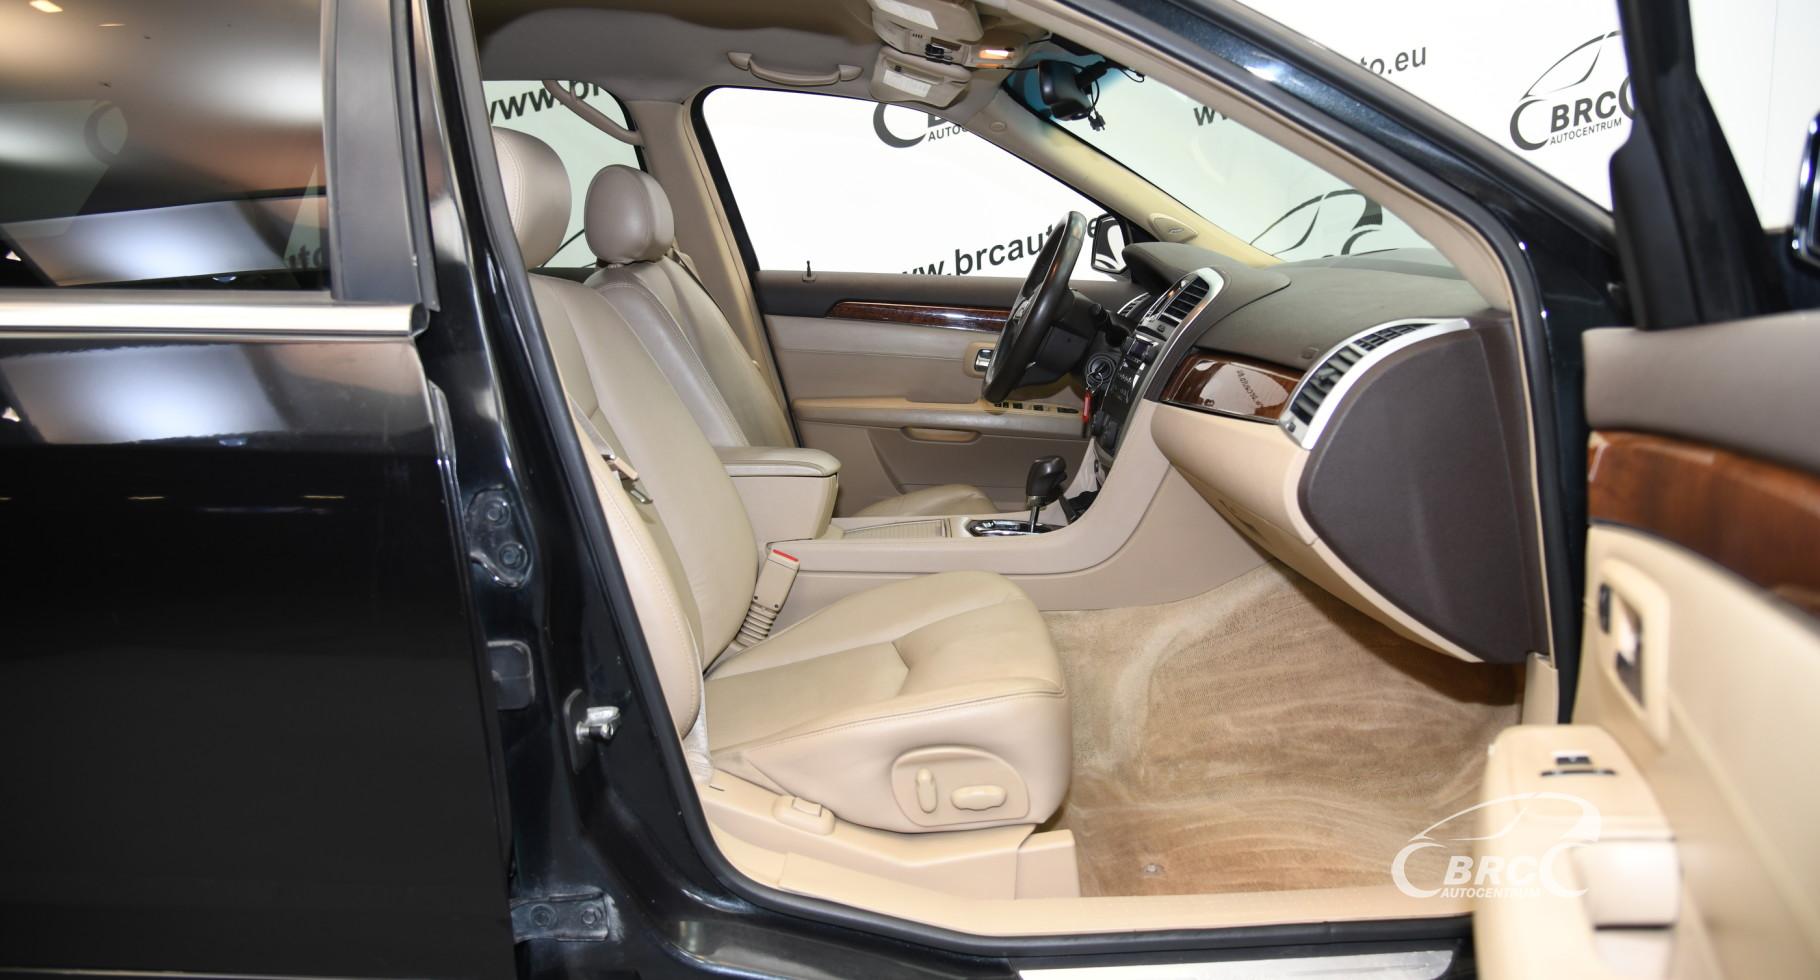 Cadillac SRX 4 3.6i AWD 7-seats Automatas